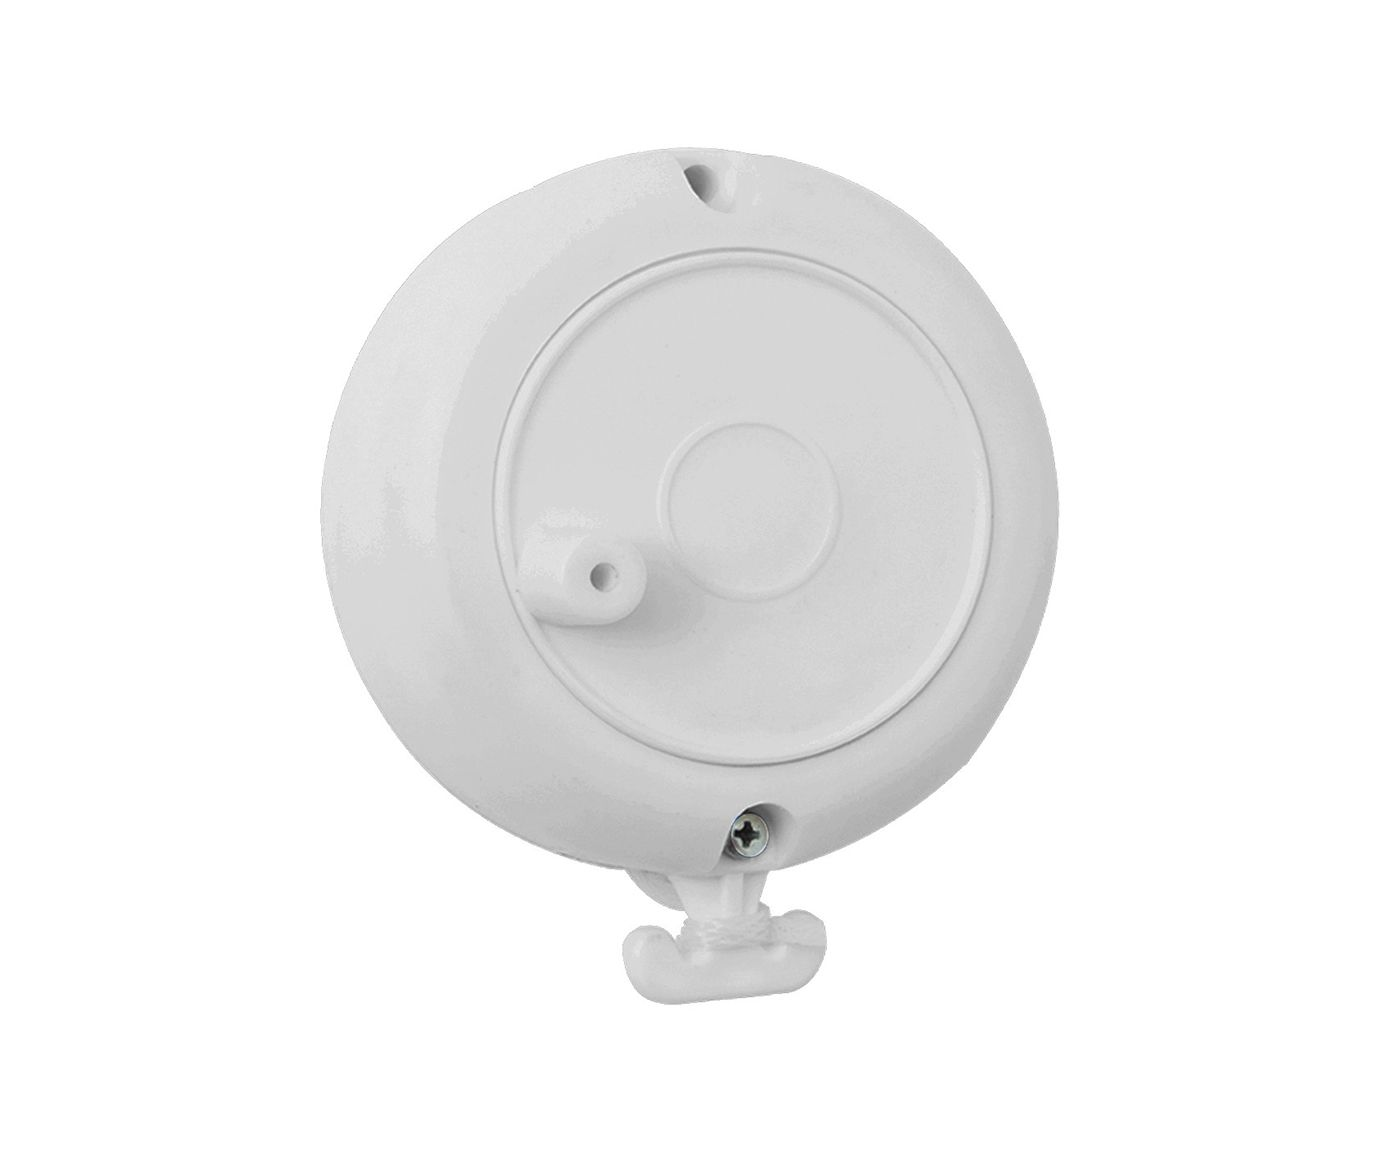 Varal Retrátil Carretilha Branco - 8X9,5X3,5cm | Westwing.com.br